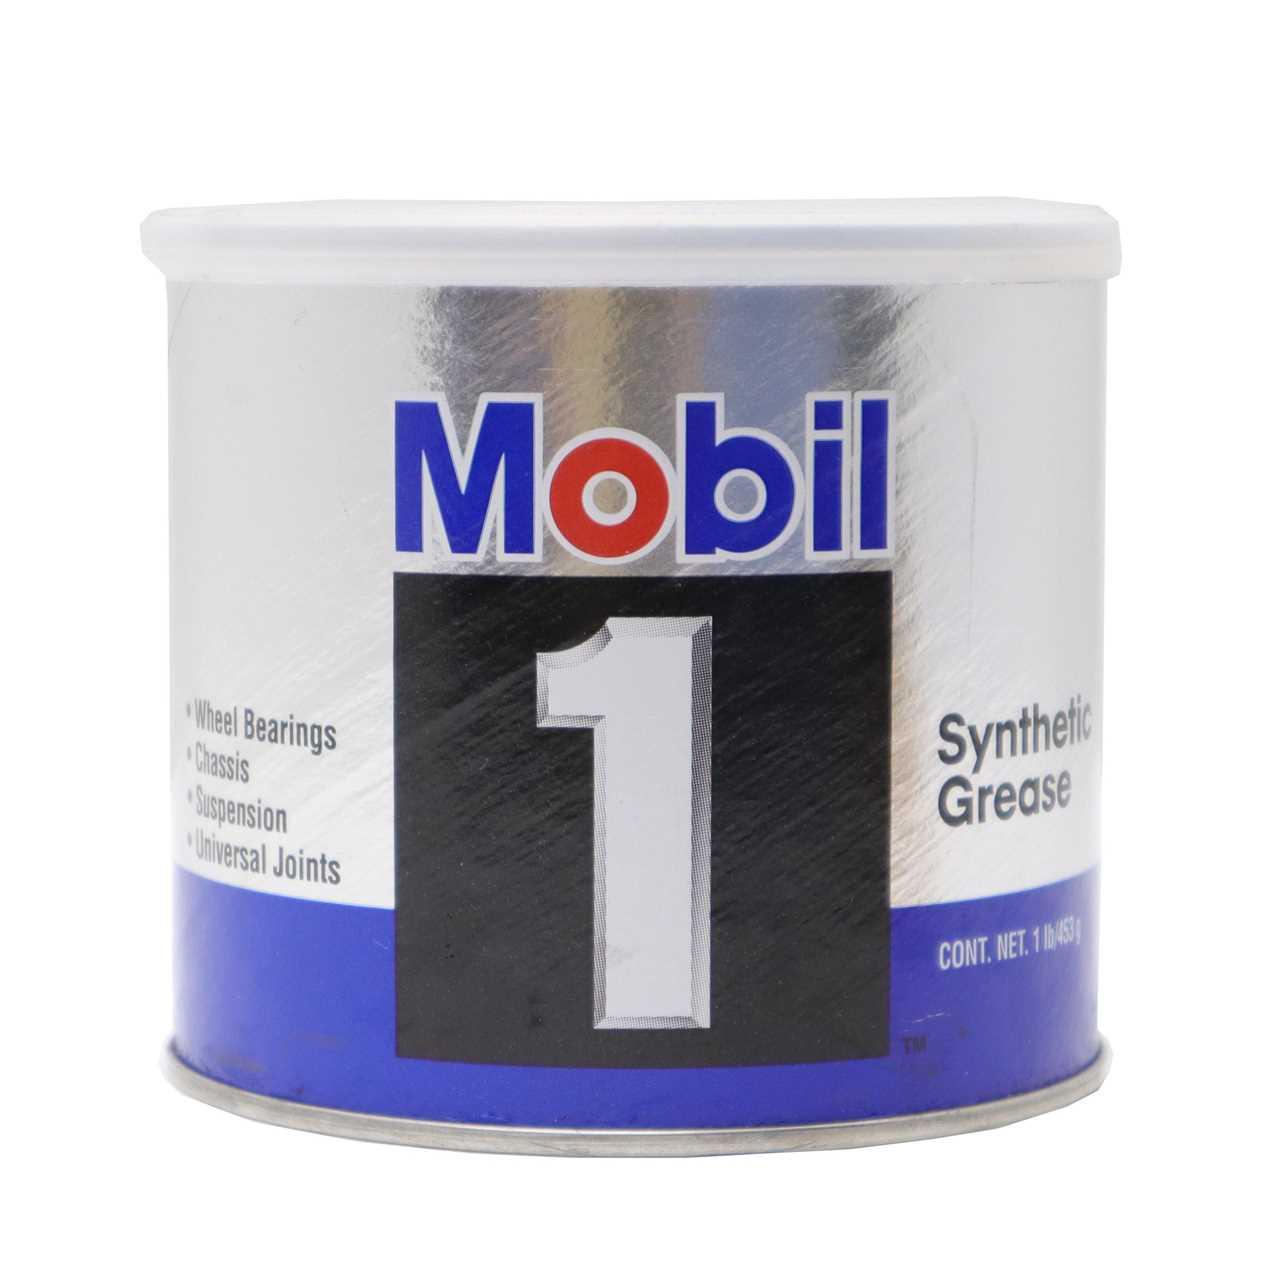 Mobil 1 シンセティックグリース 汎用万能タイプ 453g